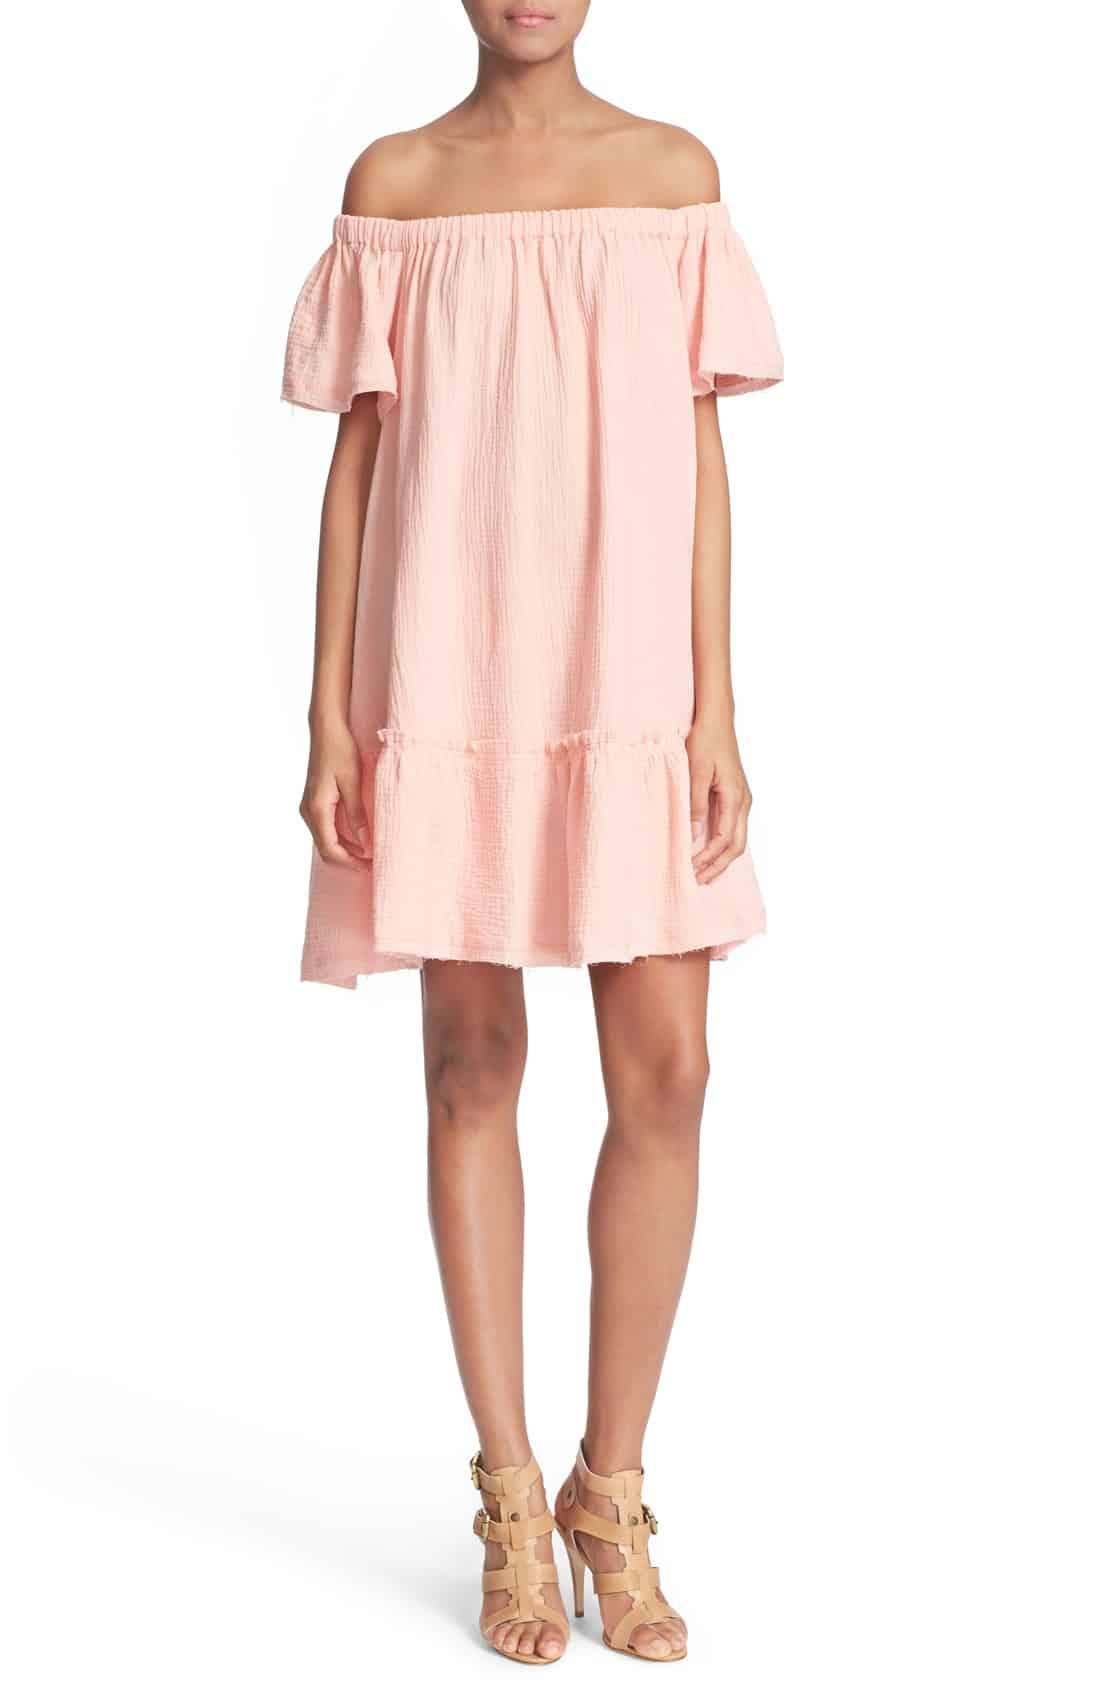 Nordstrom-Rebecca-Taylor-off-the-shoulder-blush-dress-cococozy